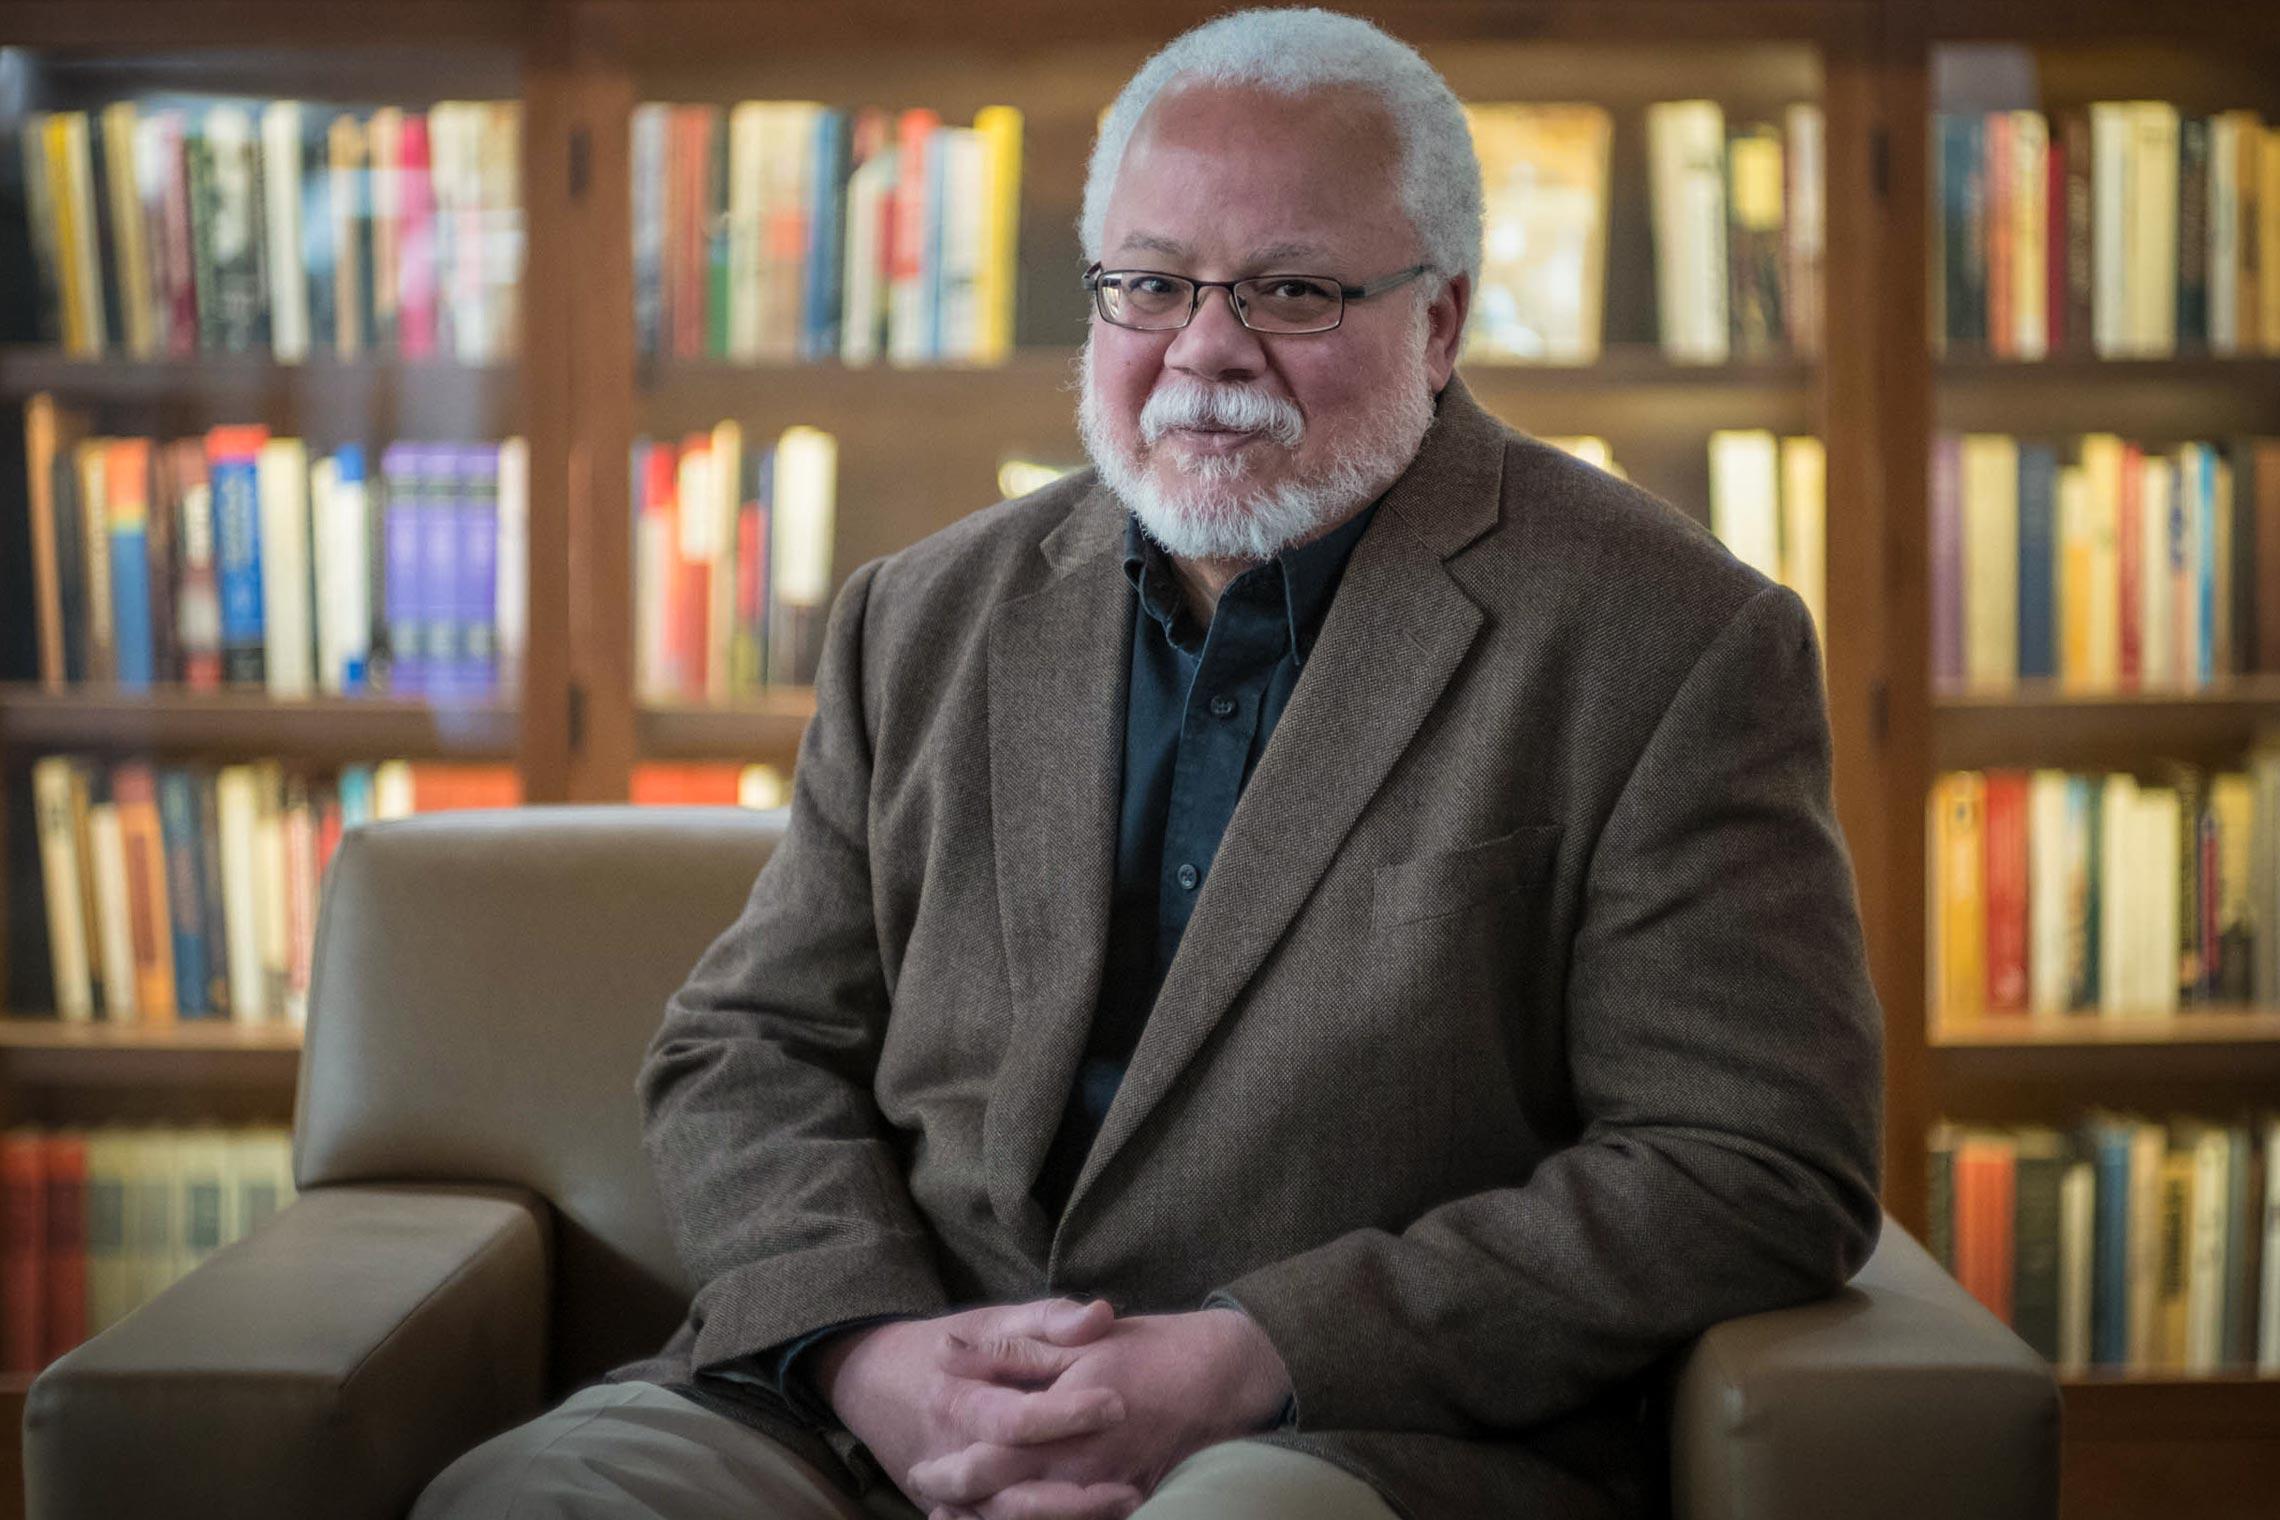 uva historian leads national geographic s unusual self examination